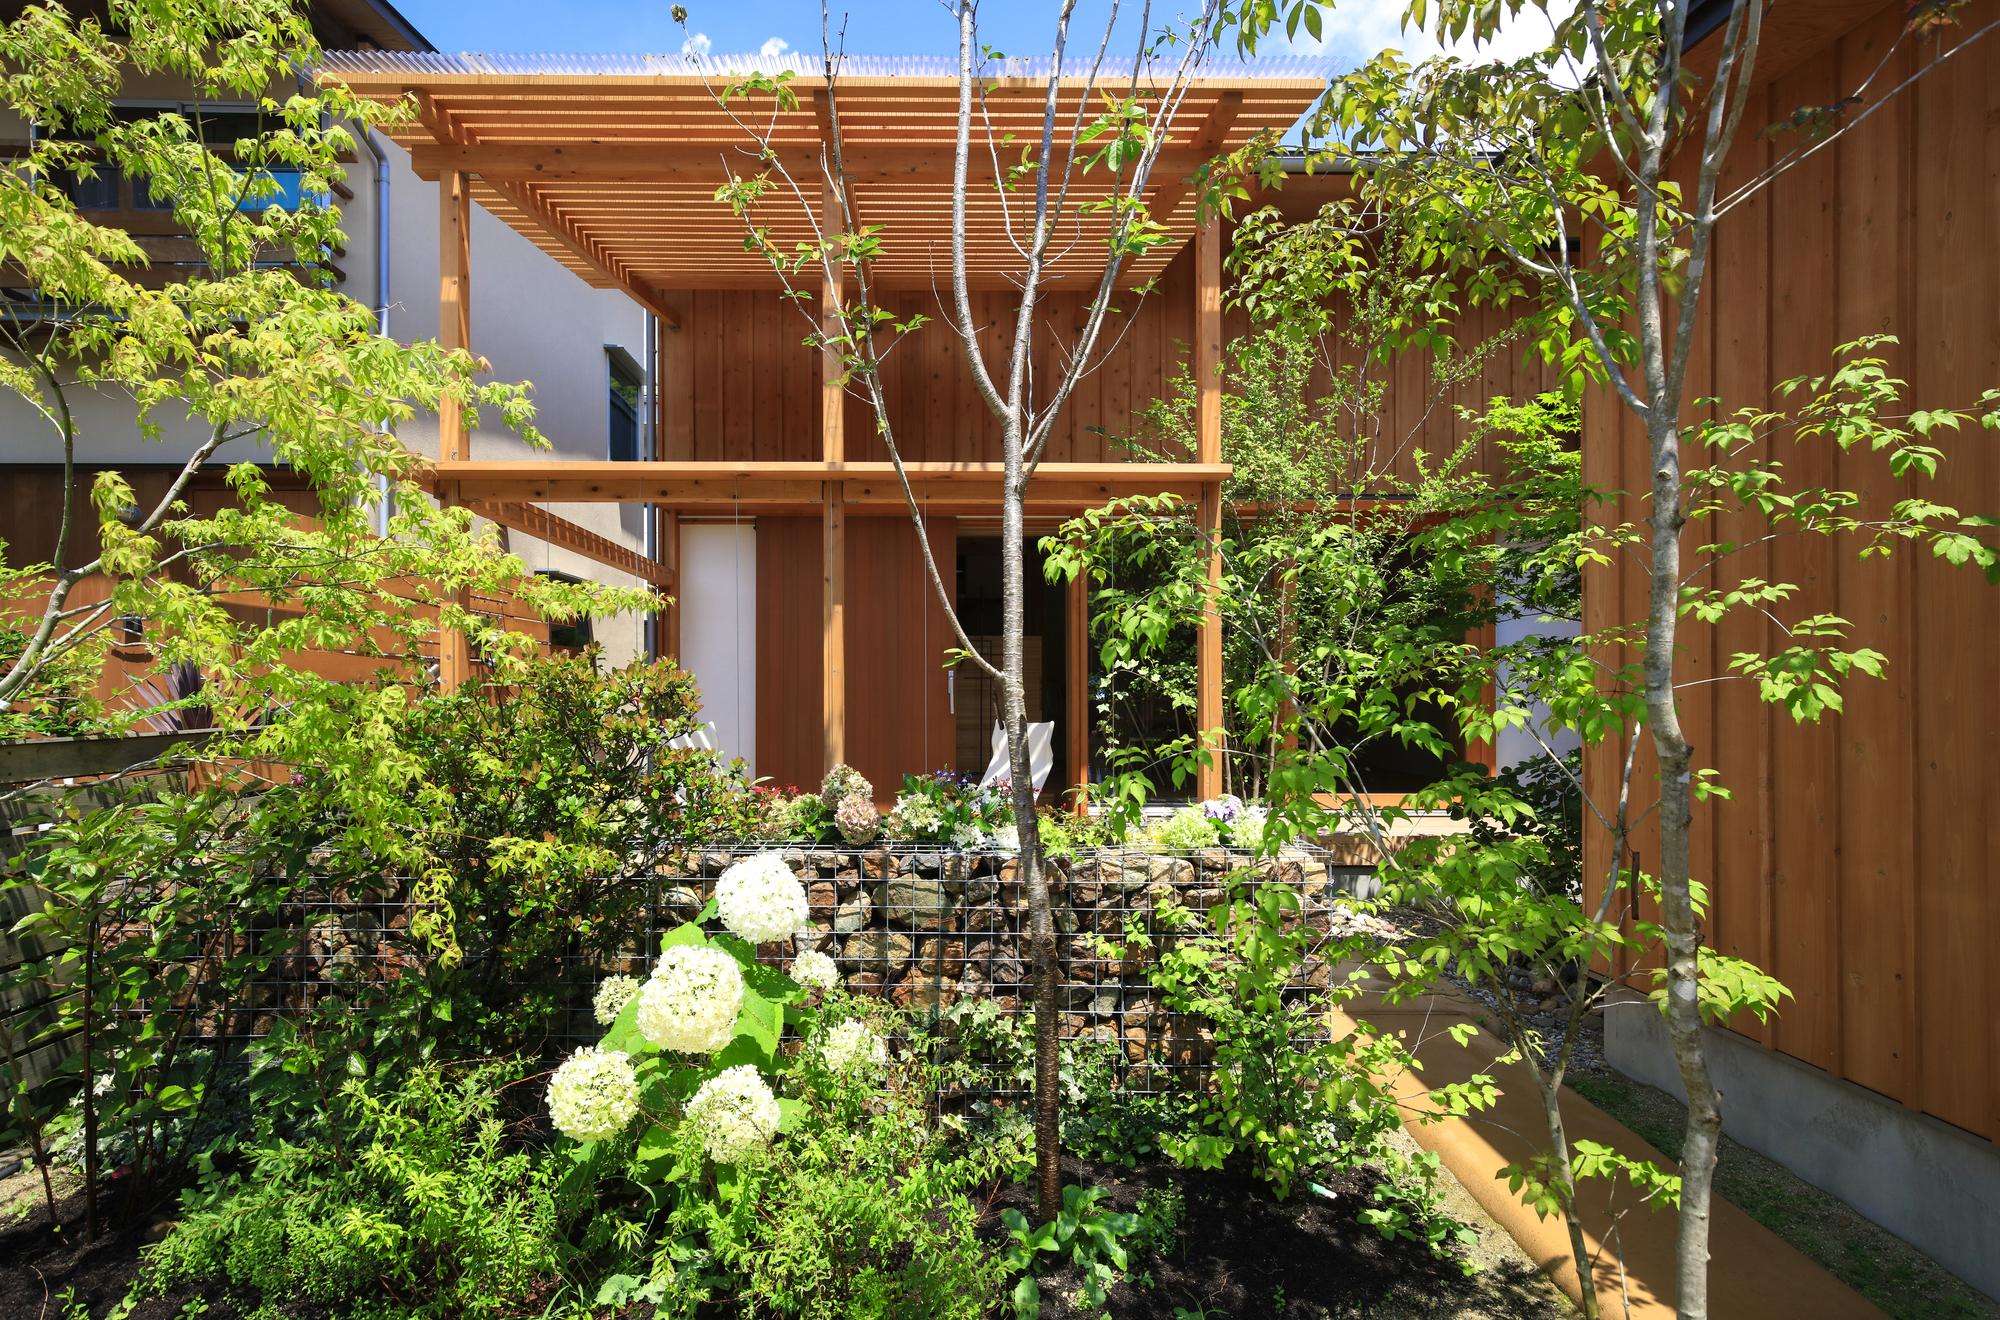 House with a Small Garden / Plan21